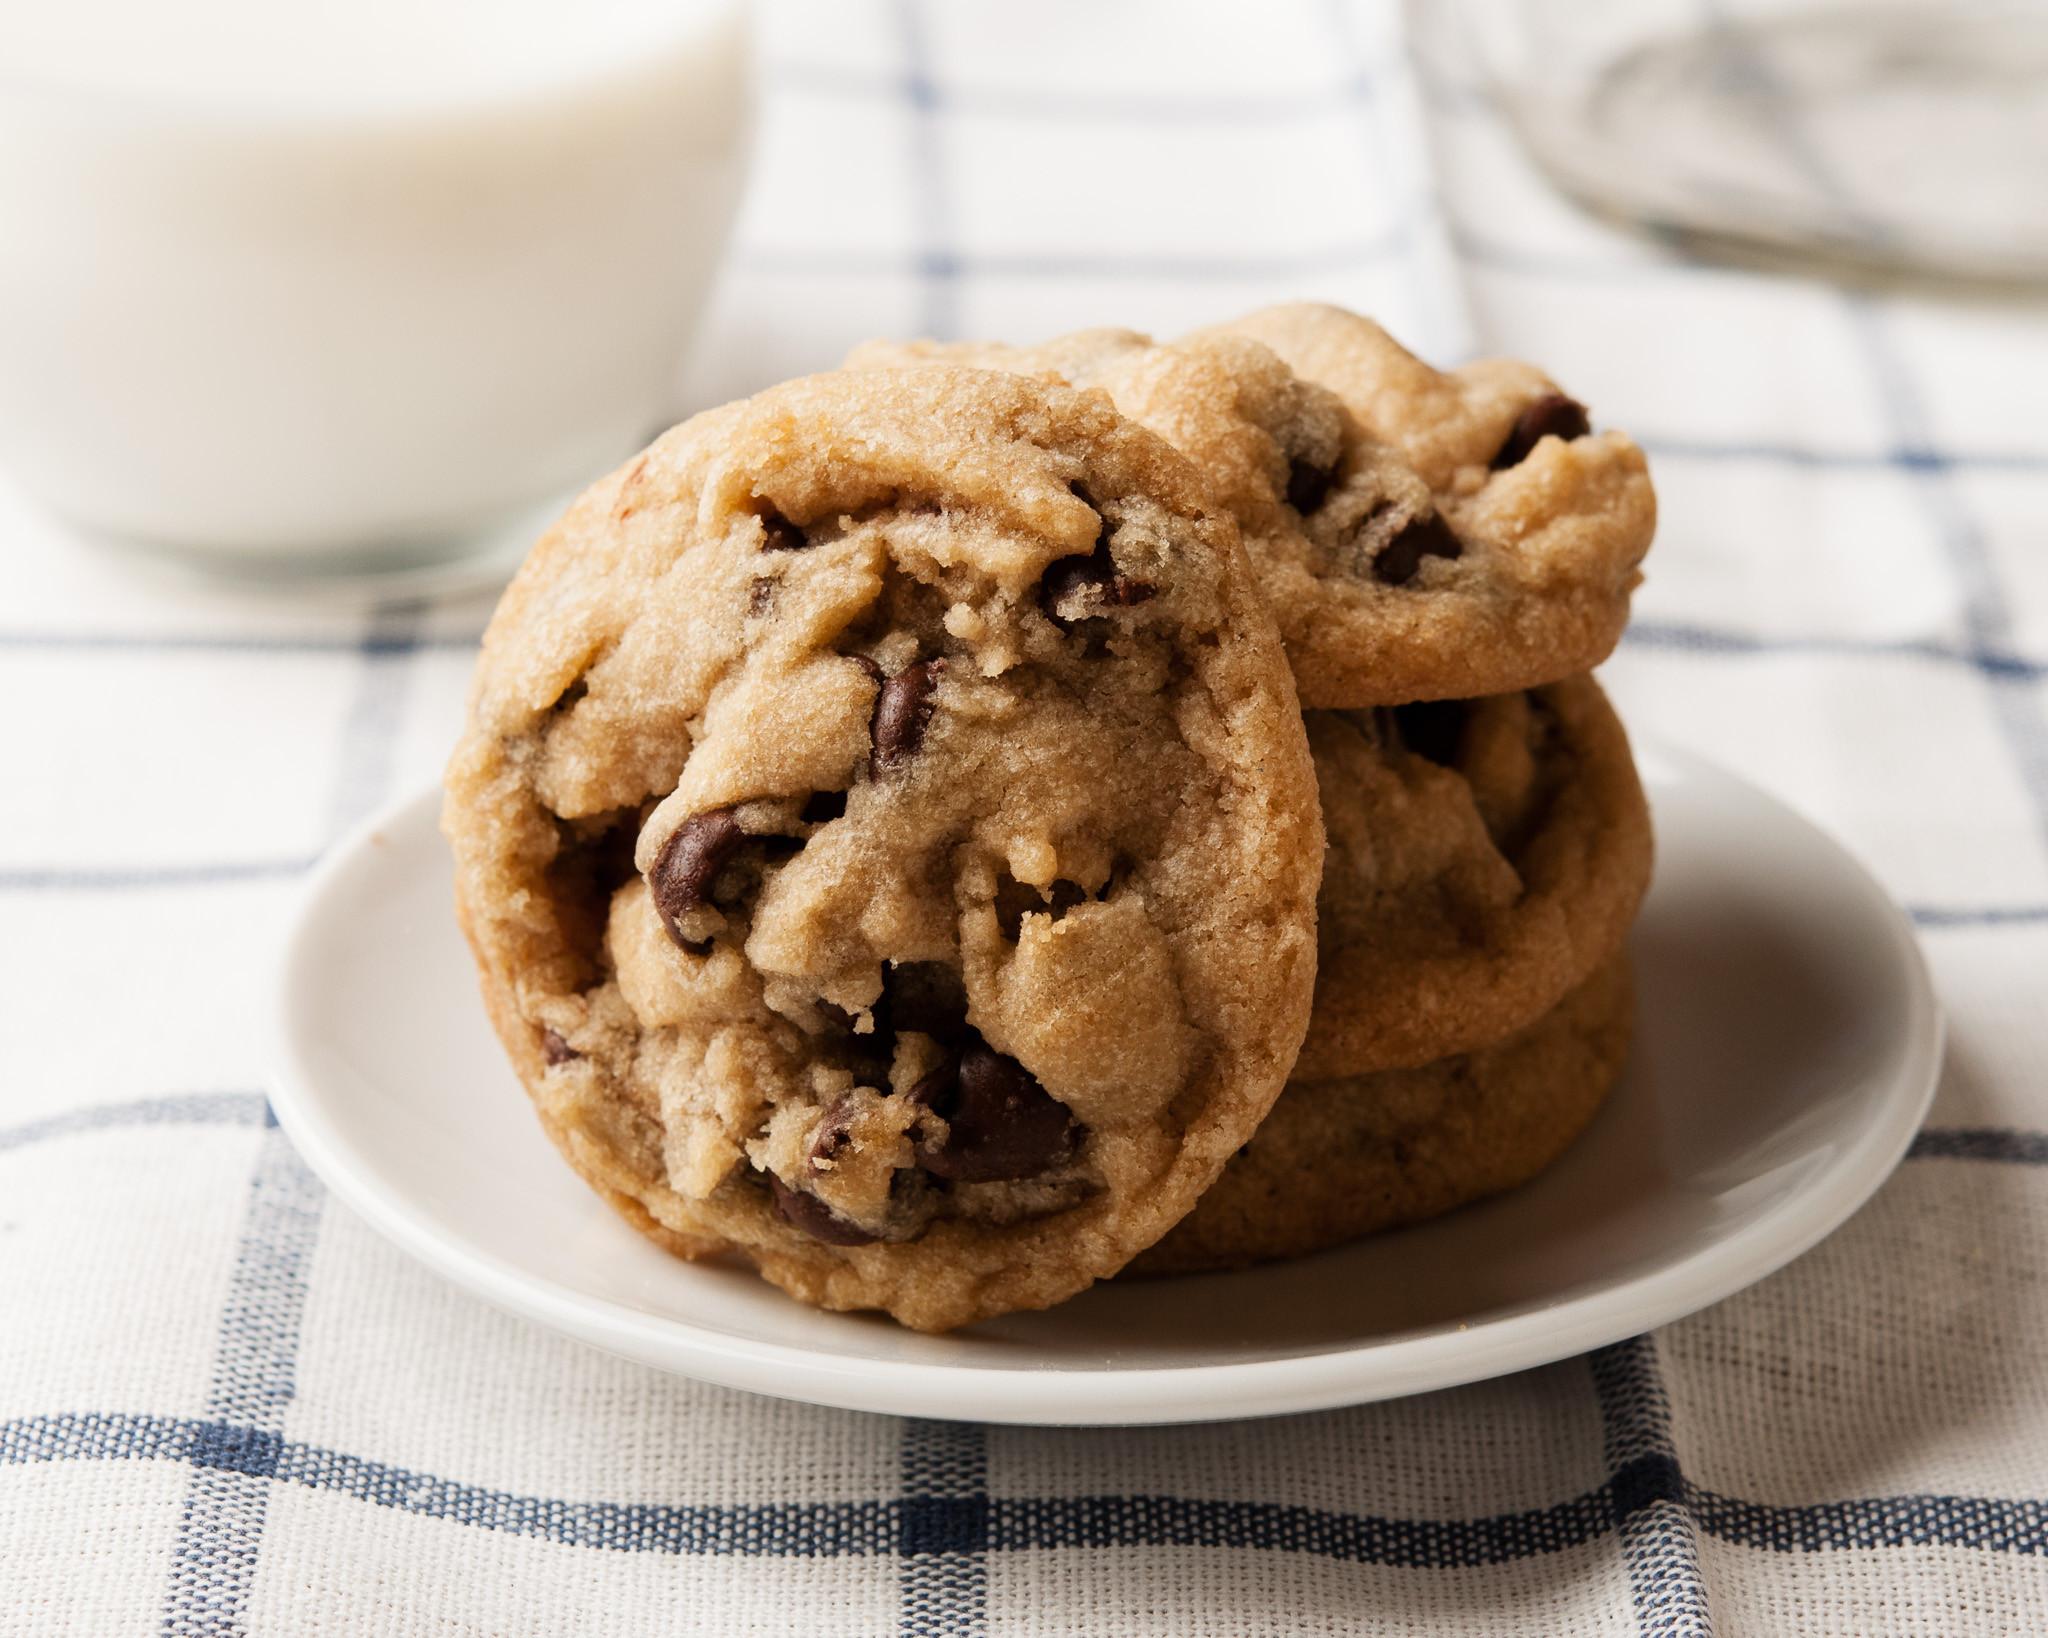 Vegan Chocolate Chip Cookies Brand  The Best Vegan Chocolate Chip Cookies I bake he shoots